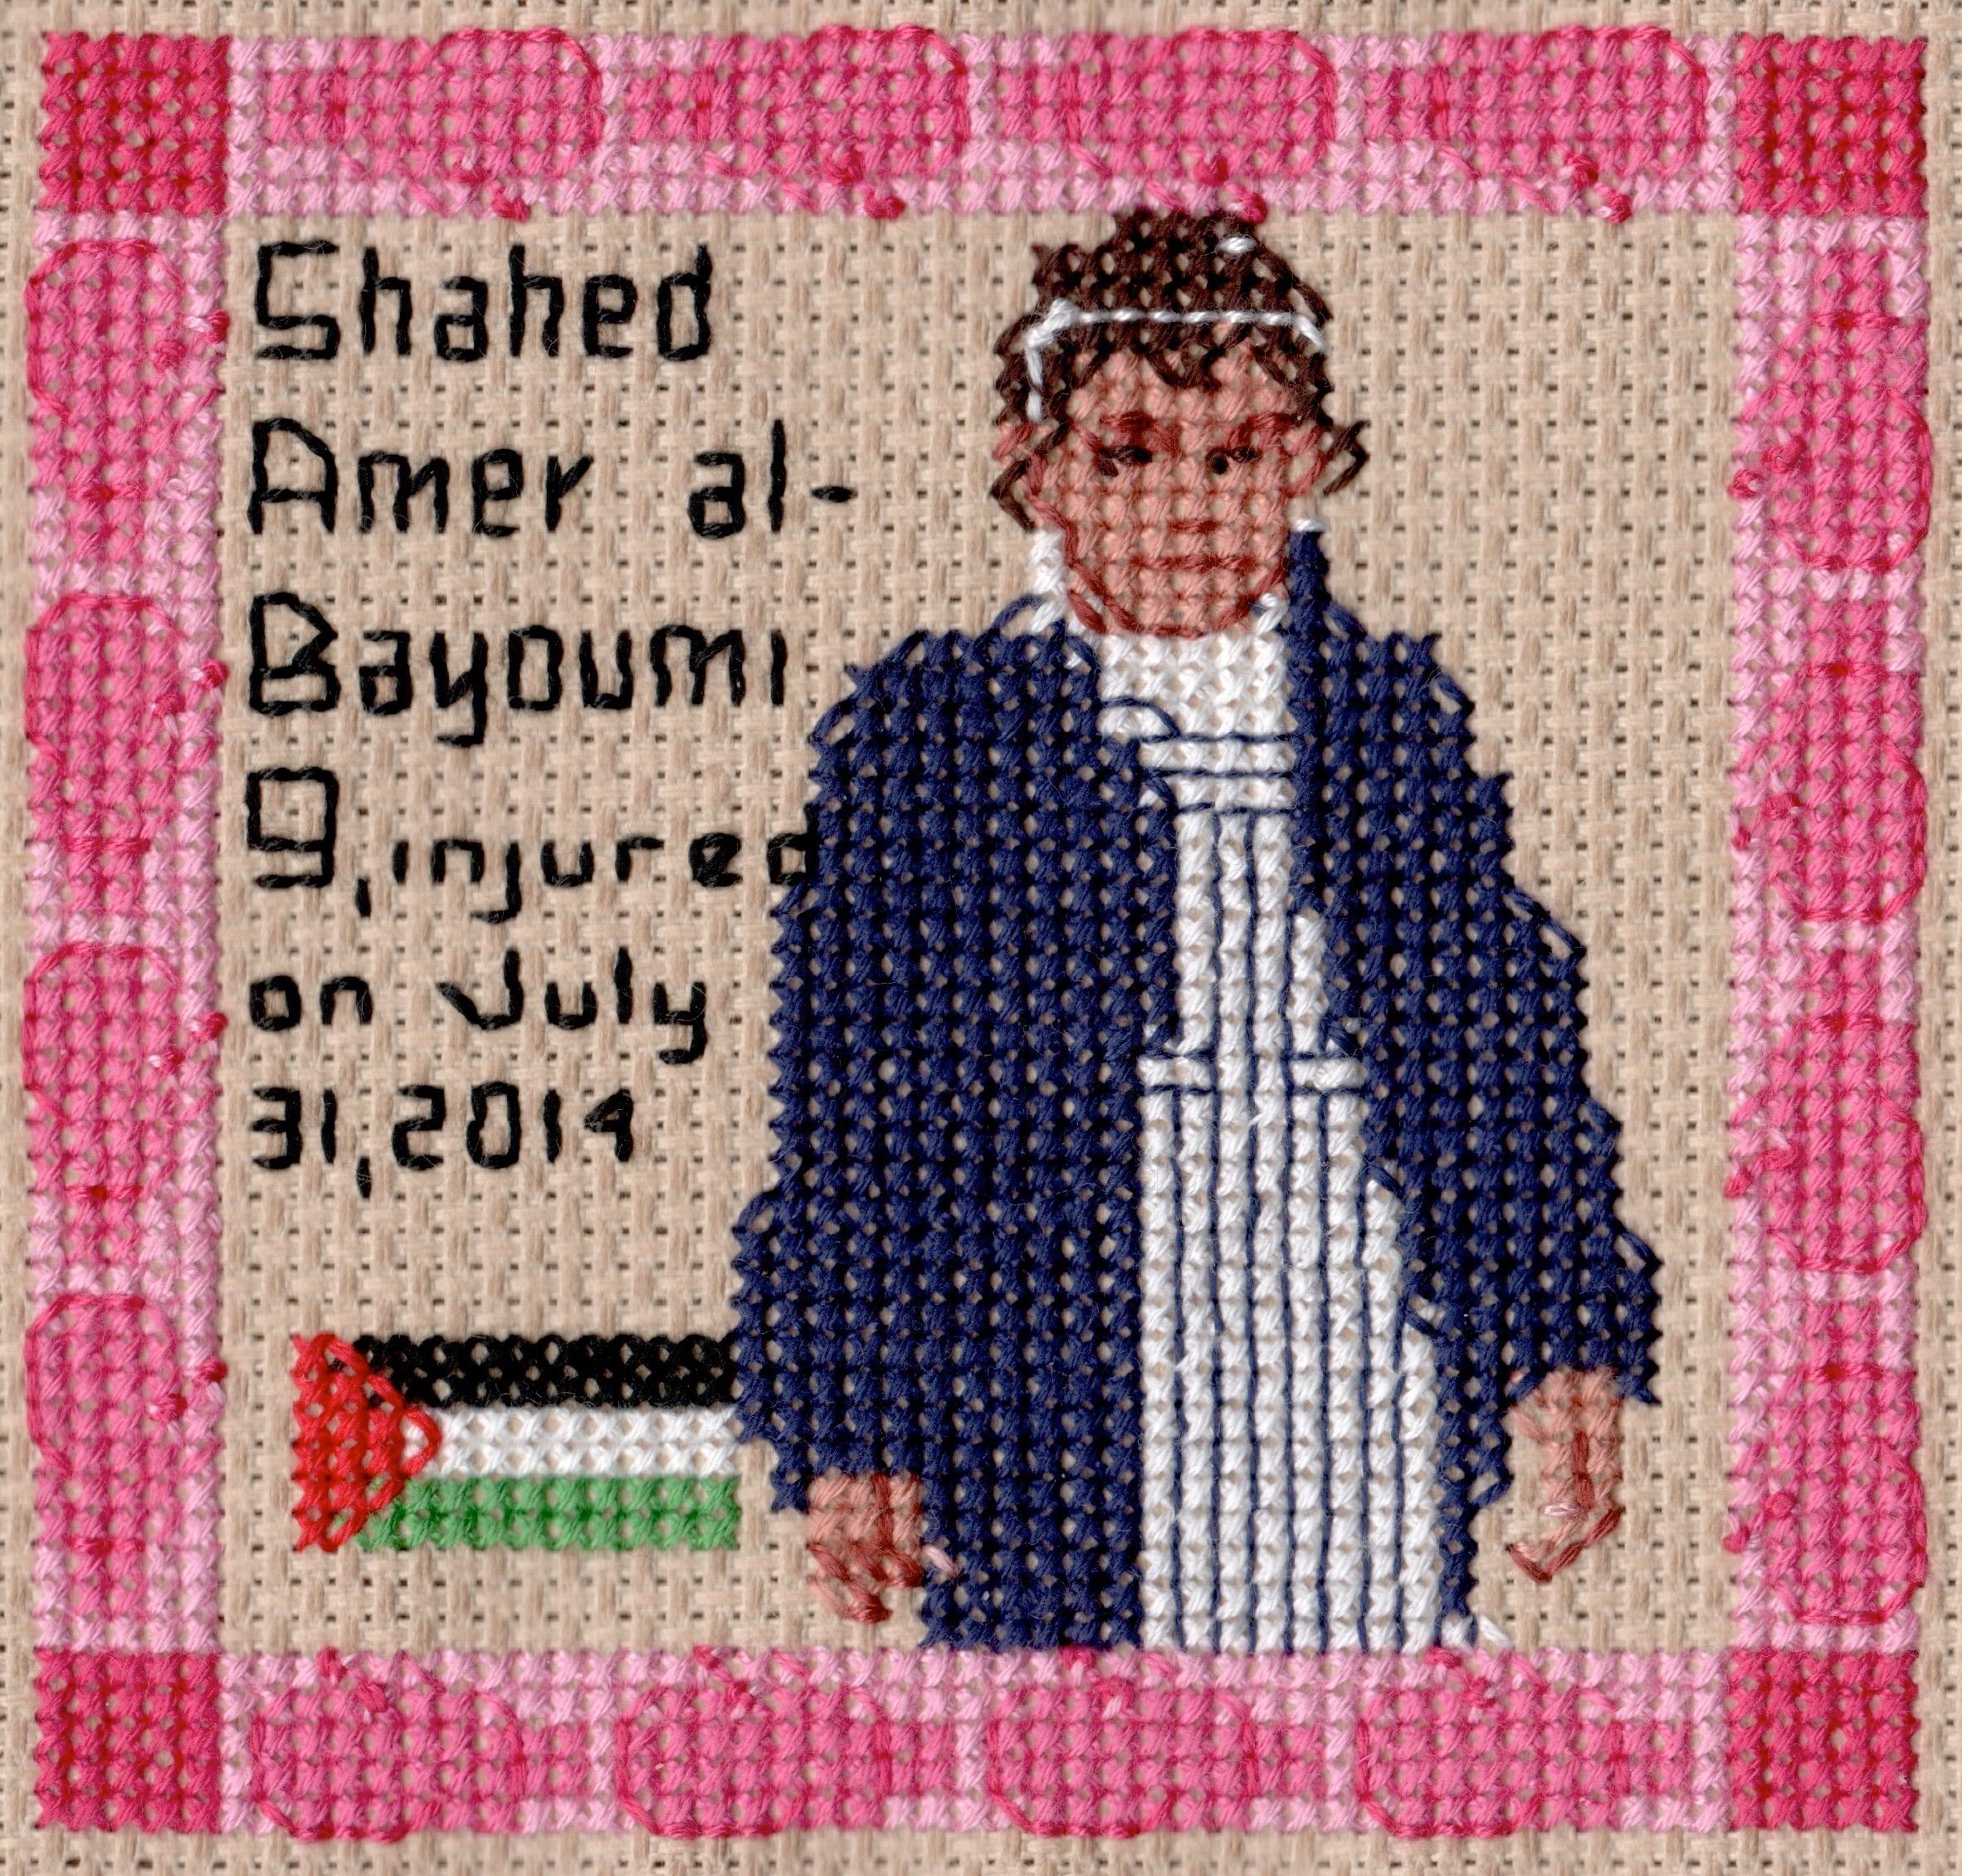 13 Shahed Amer al-Bayoum